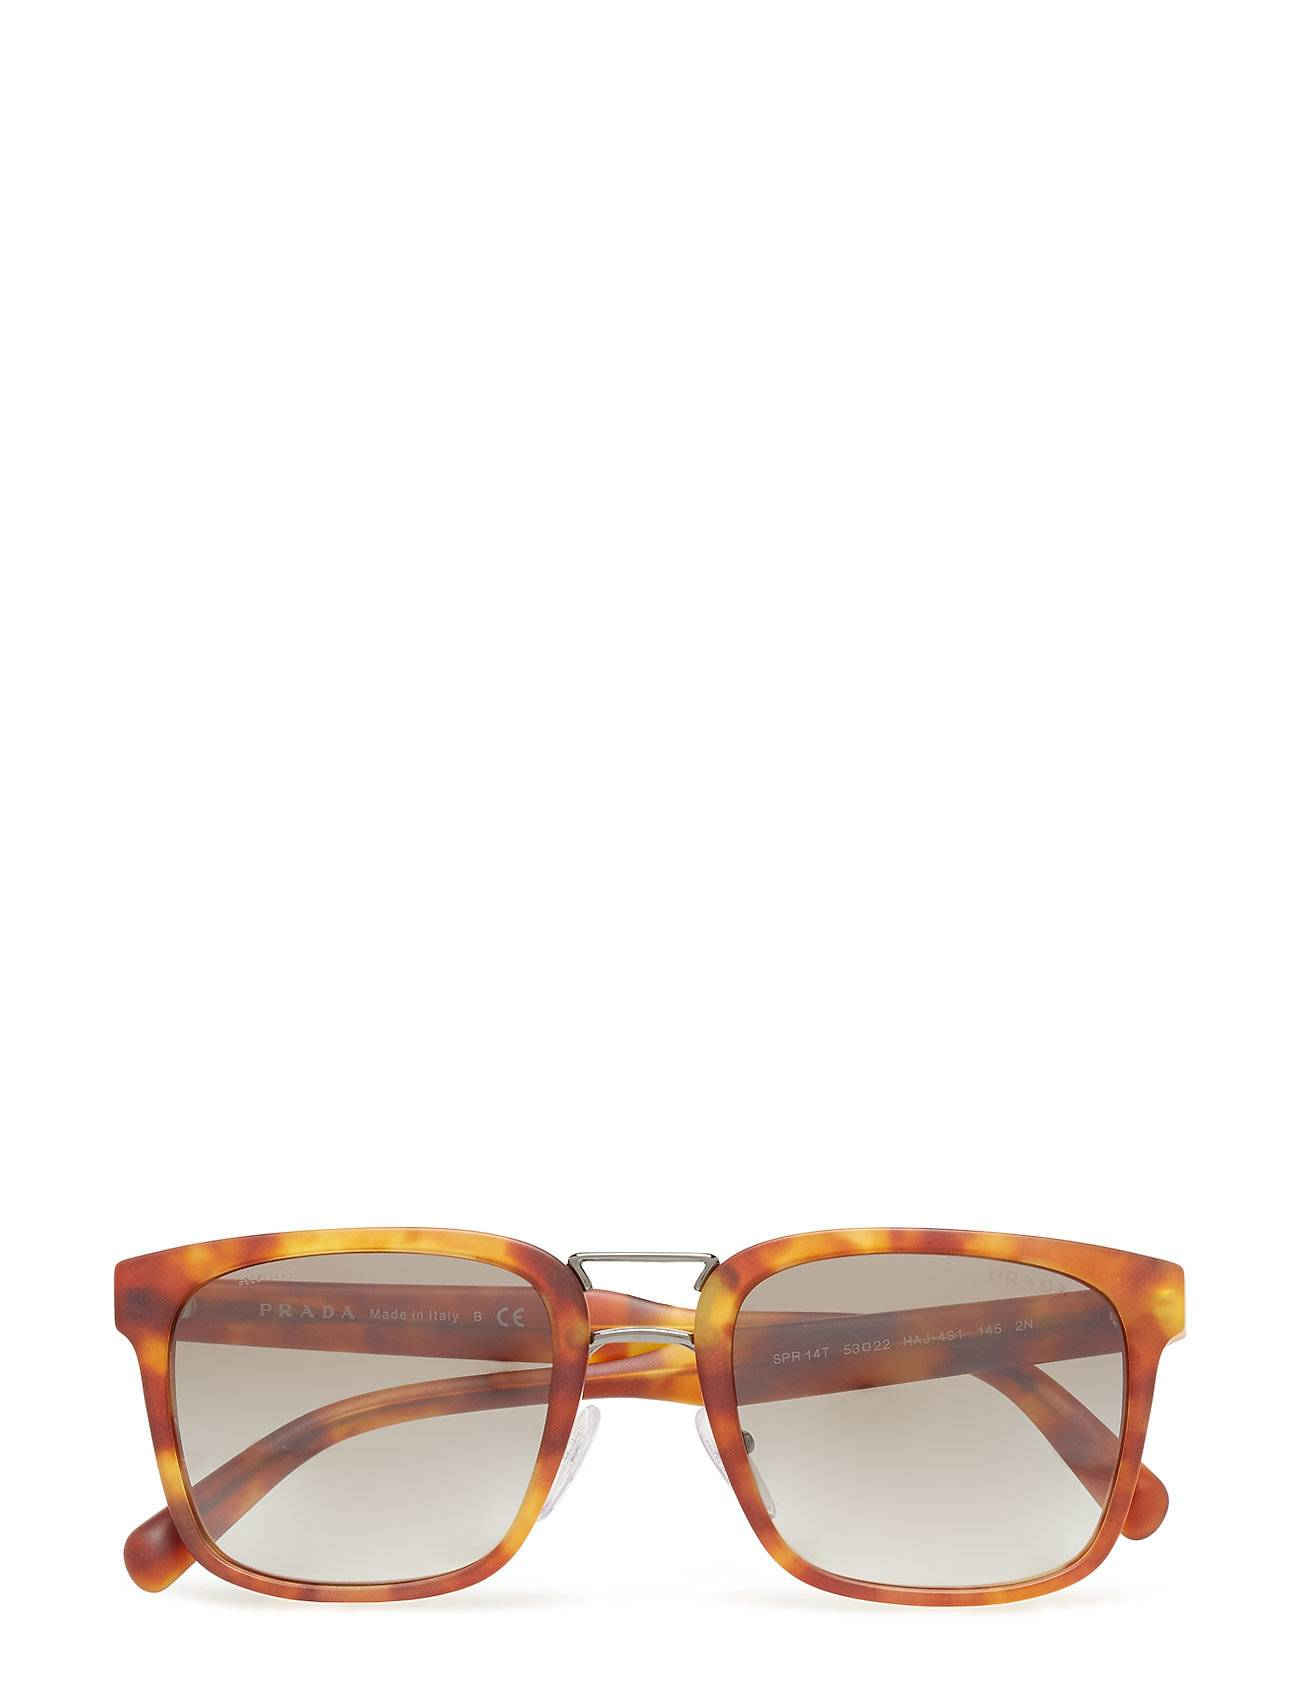 Image of Prada Sunglasses D-Frame Wayfarer Aurinkolasit Ruskea